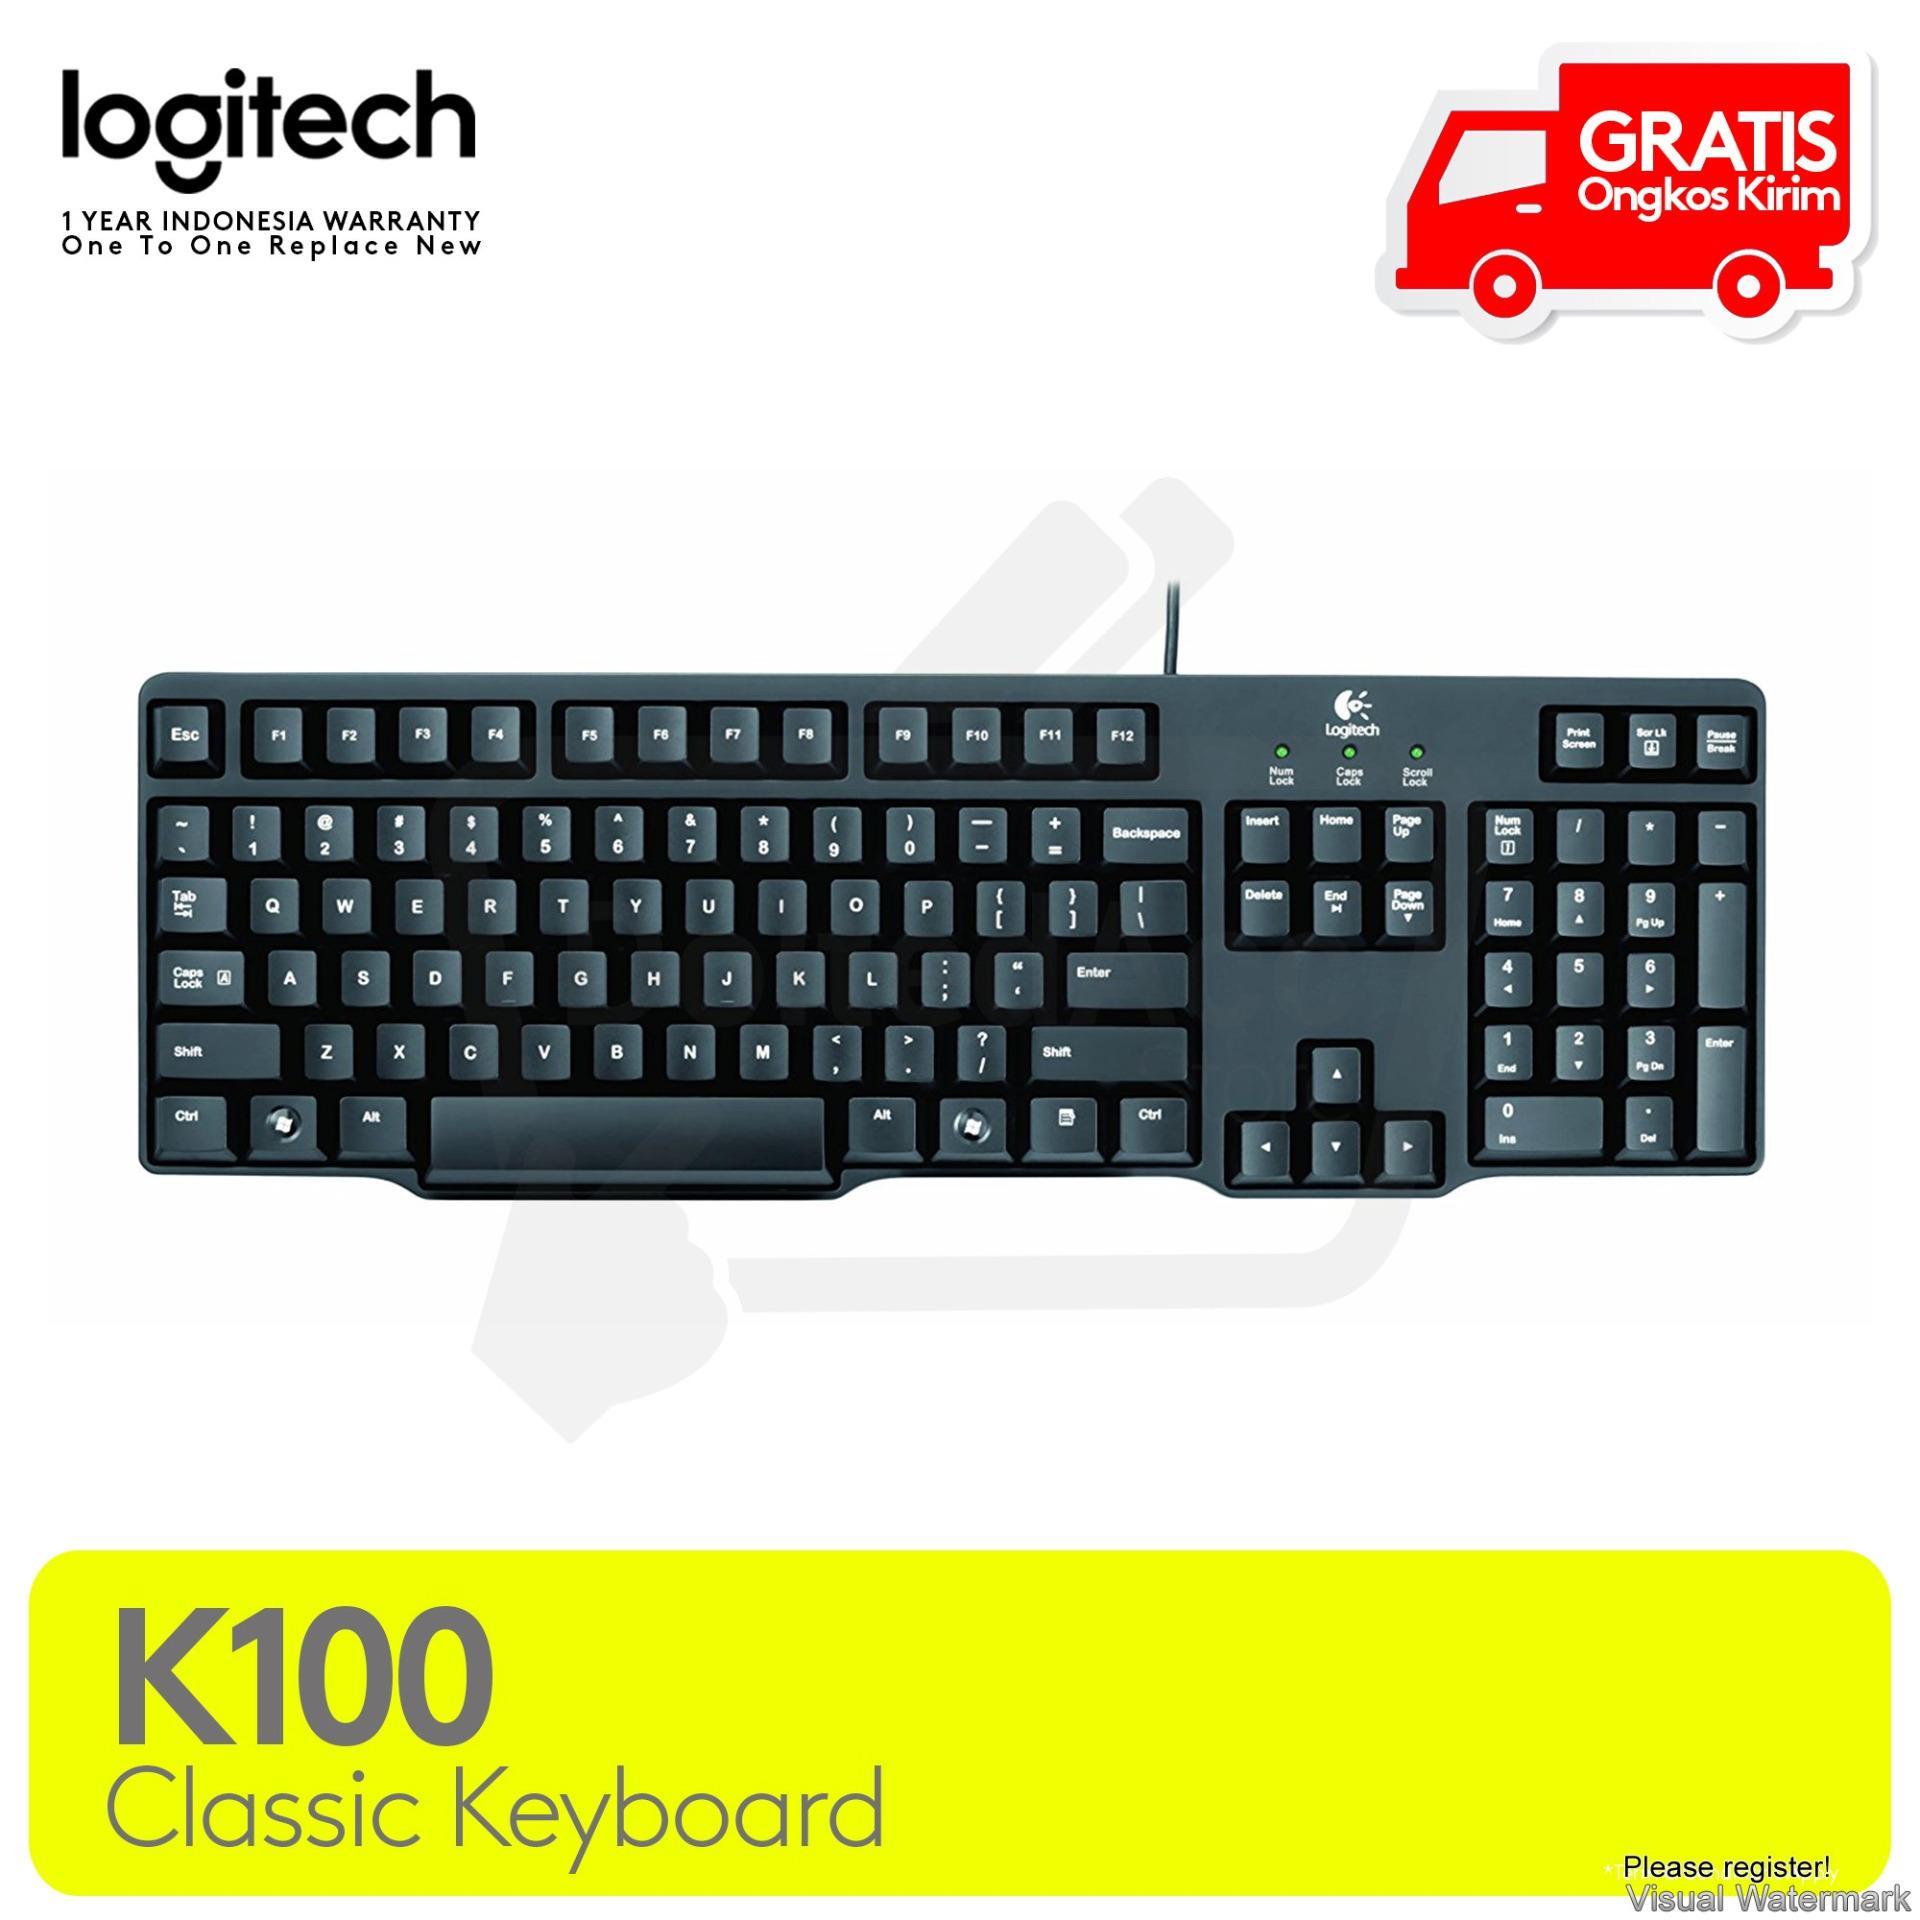 Logitech Keyboard Classic PS2 K100 - Hitam